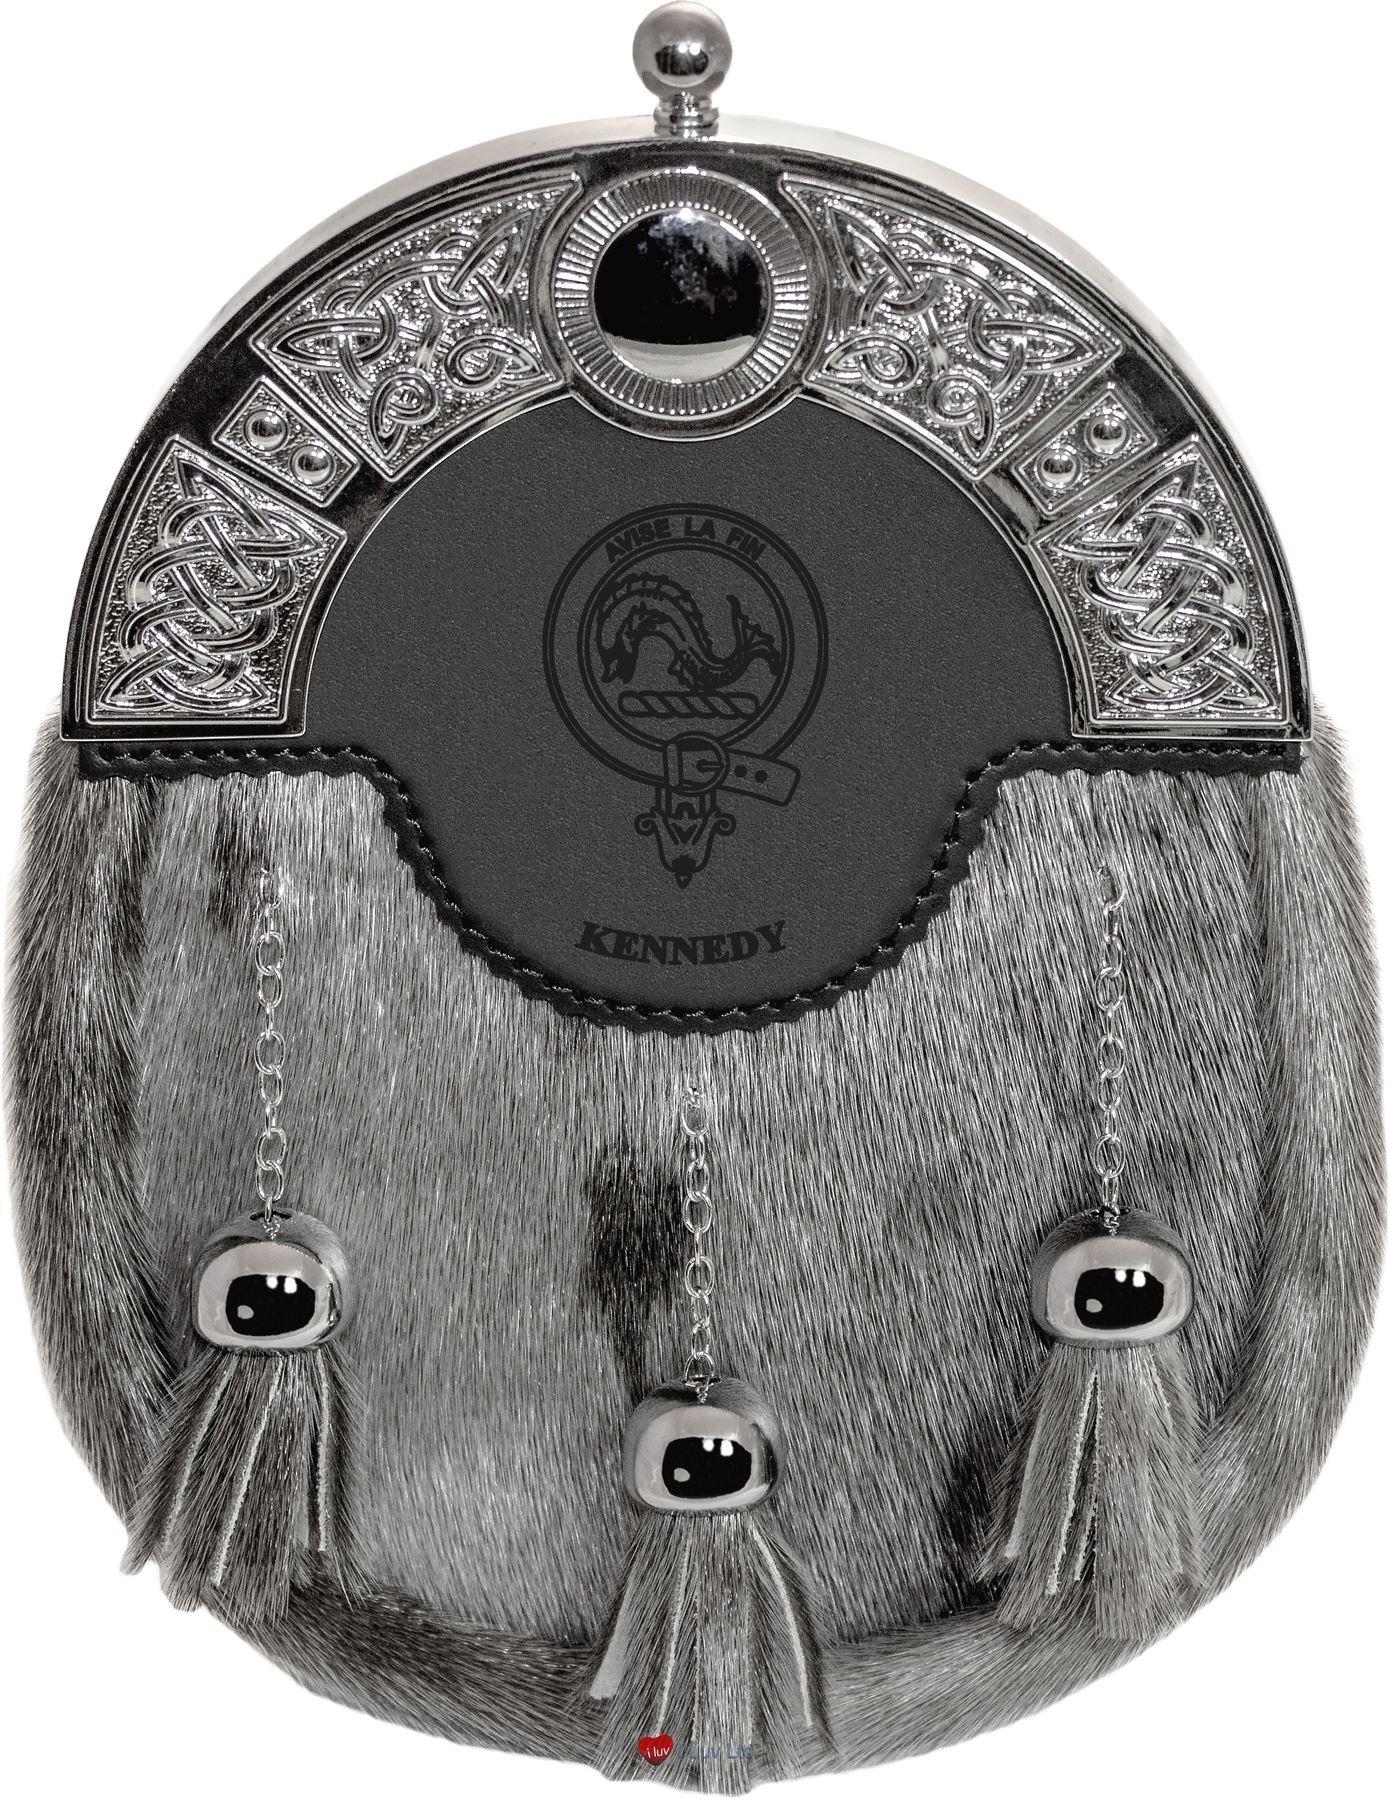 Kennedy Dress Sporran 3 Tassels Studded Targe Celtic Arch Scottish Clan Name Crest